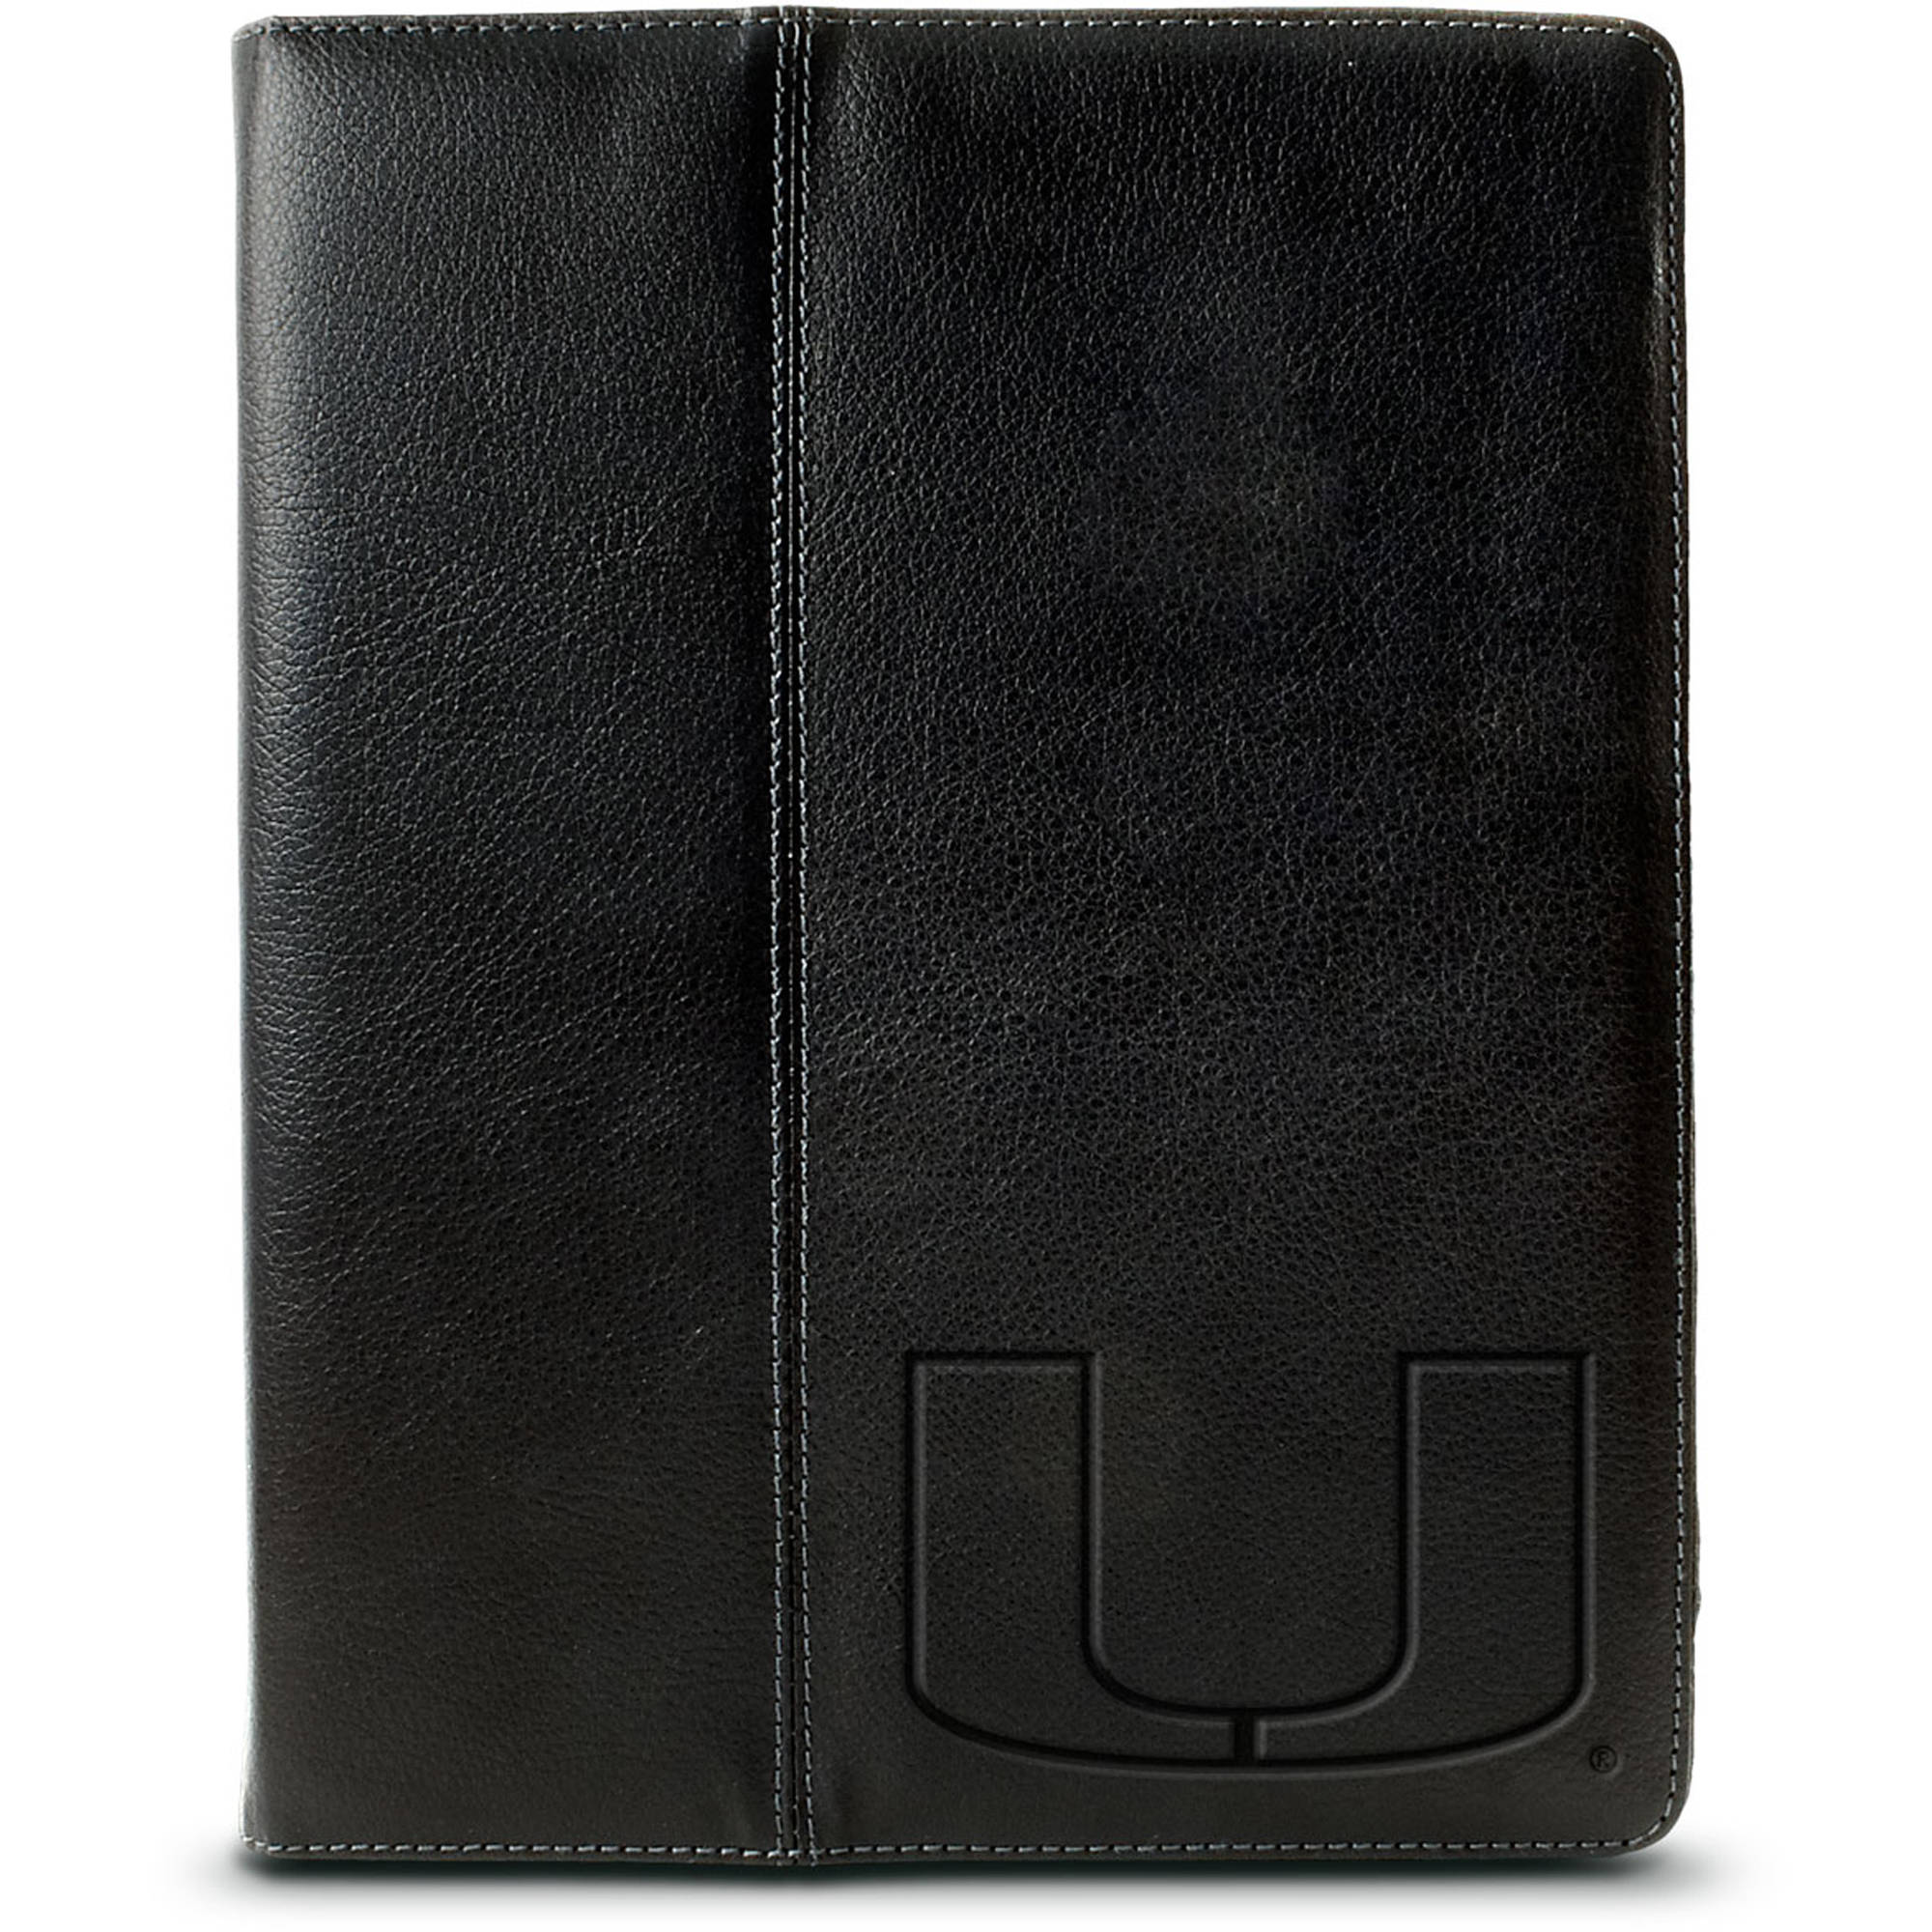 Centon iPad Leather Folio Case University of Miami